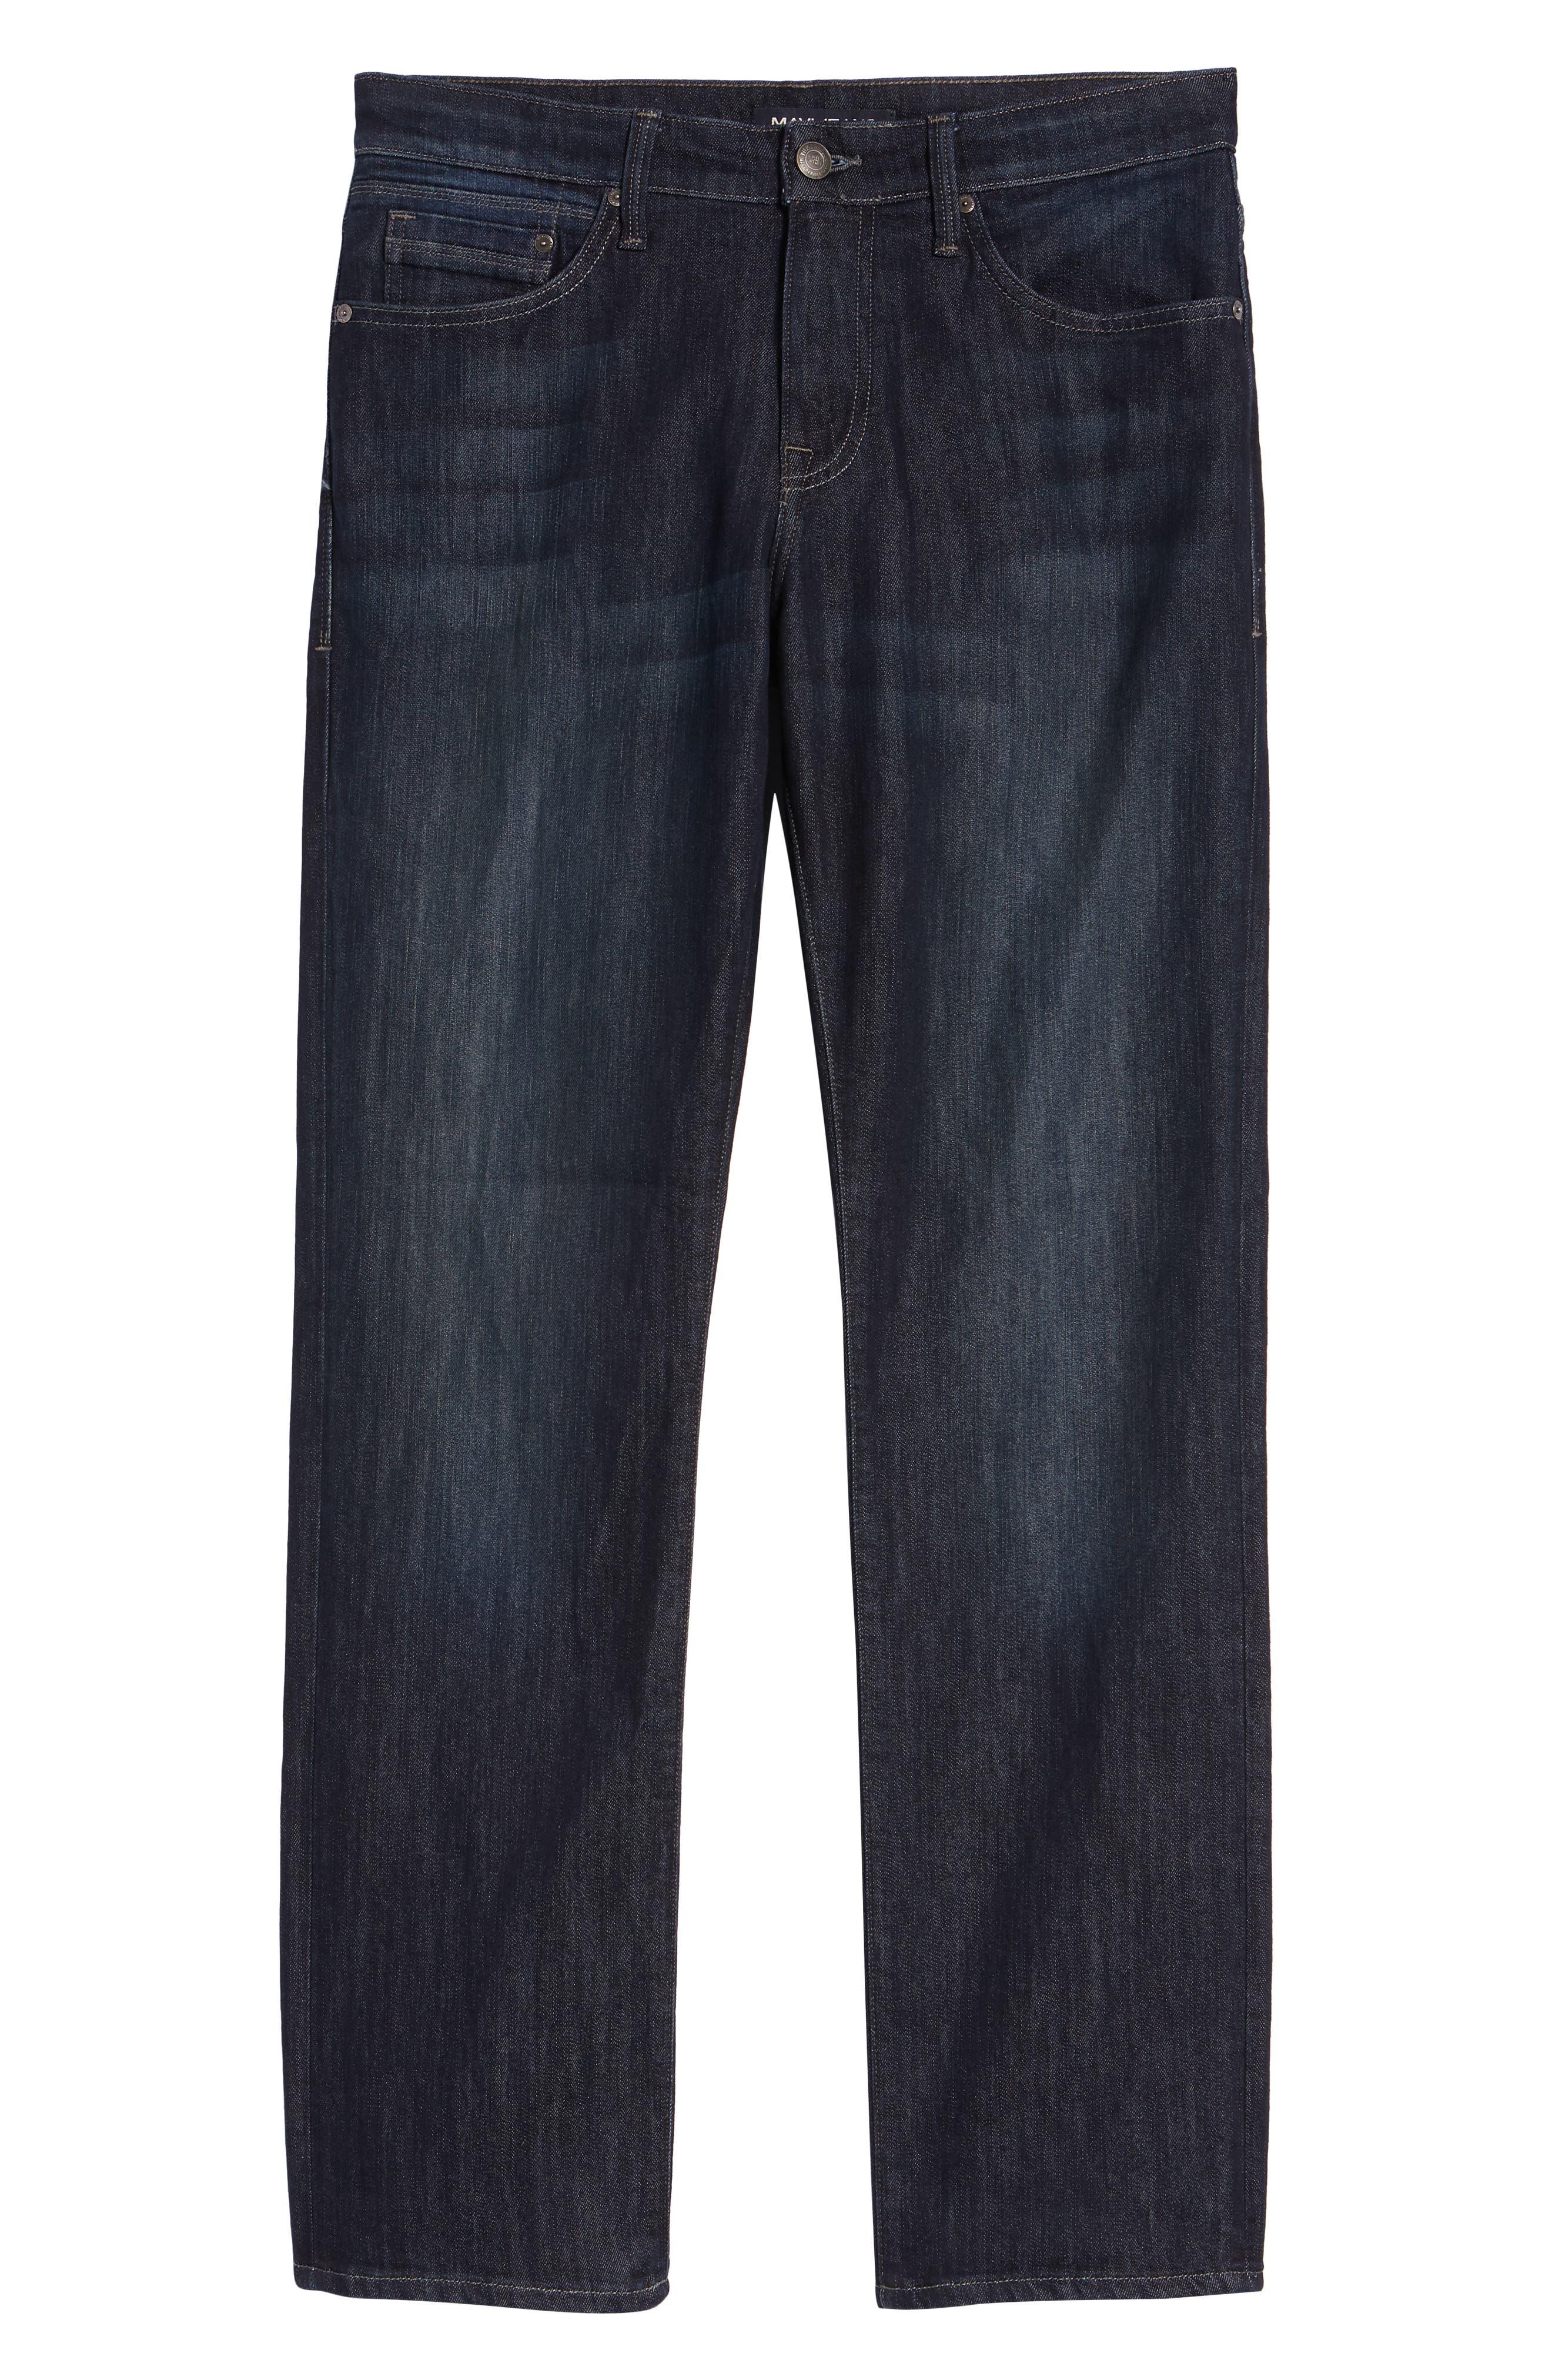 MAVI JEANS, 'Matt' Relaxed Fit Jeans, Alternate thumbnail 2, color, DEEP STANFORD COMFORT